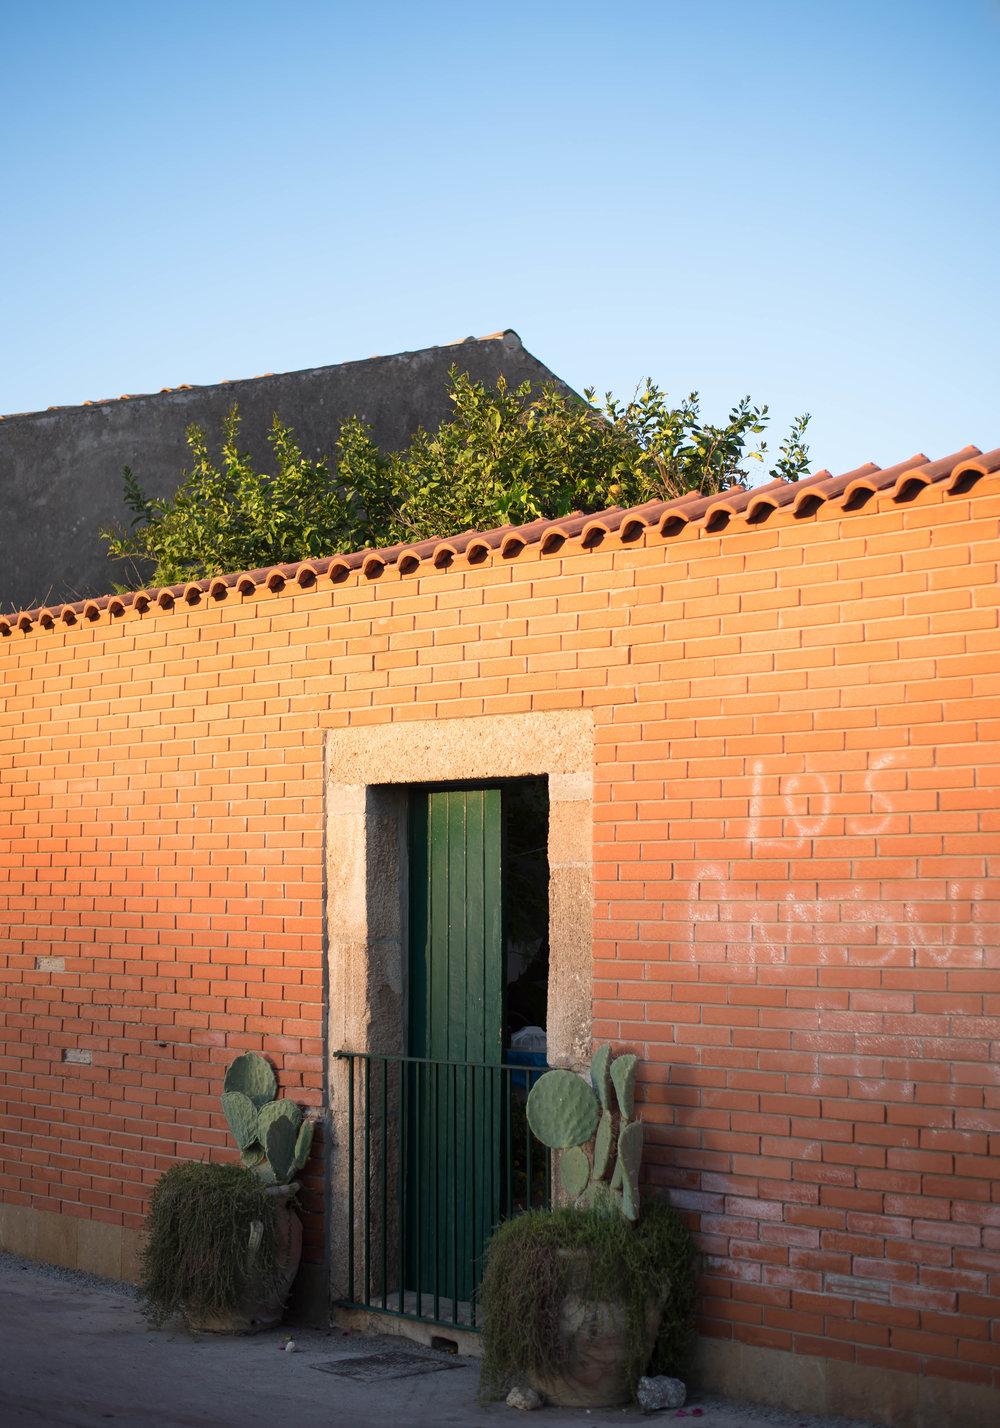 2015_09_23 brucoli_sicilia_italia cactus pots 1 V1.jpg